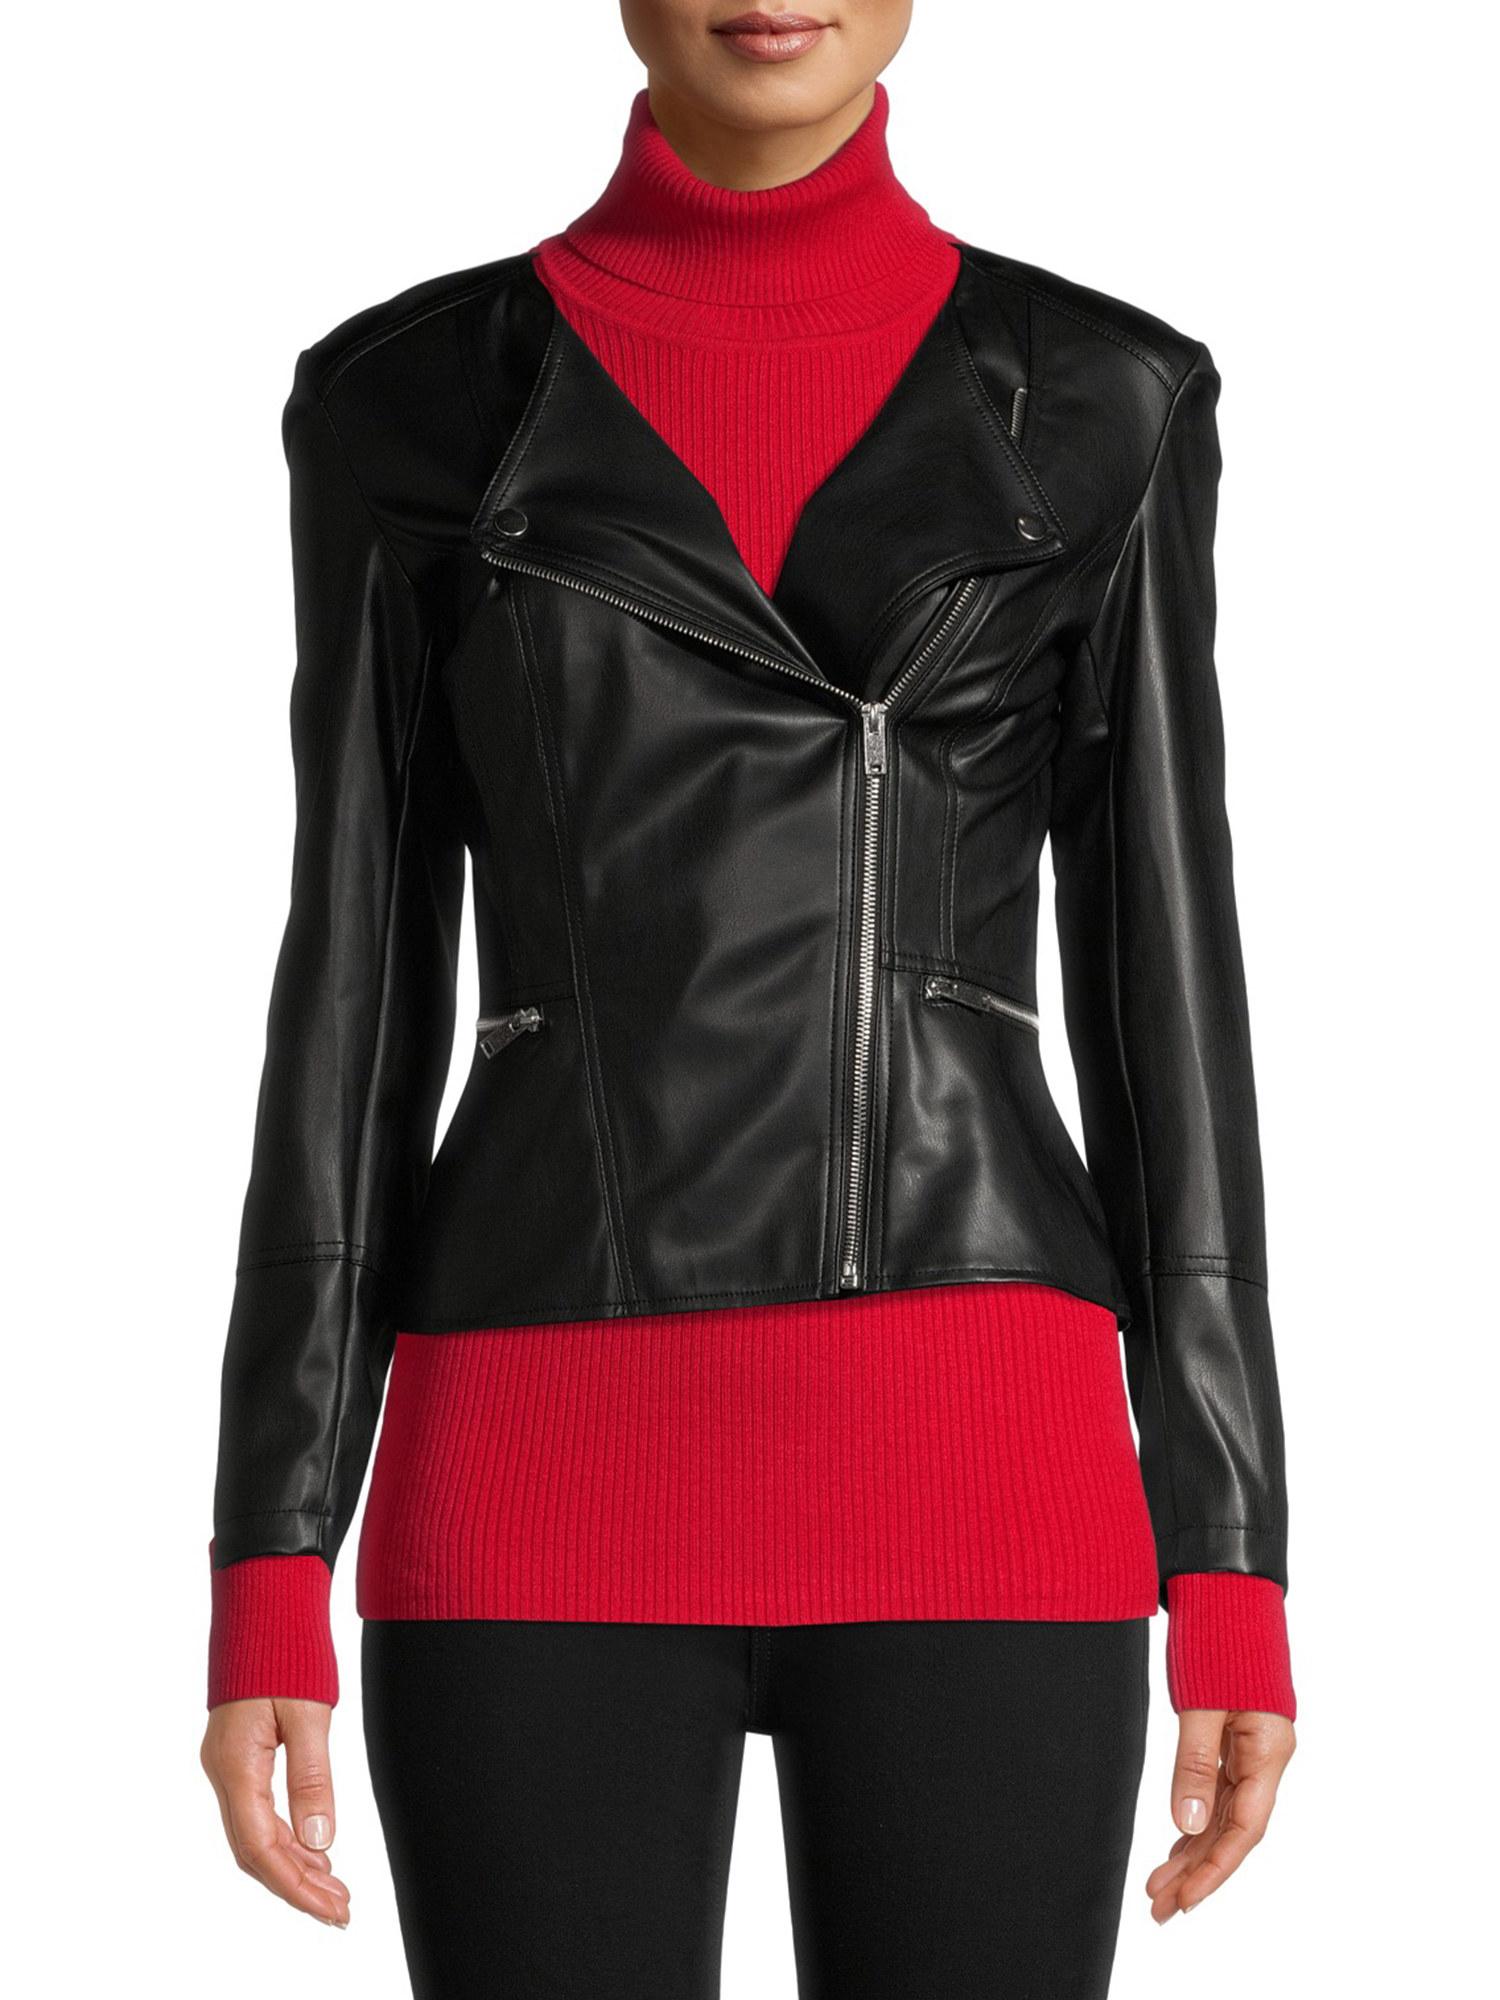 person wearing a black faux fur peplum jacket